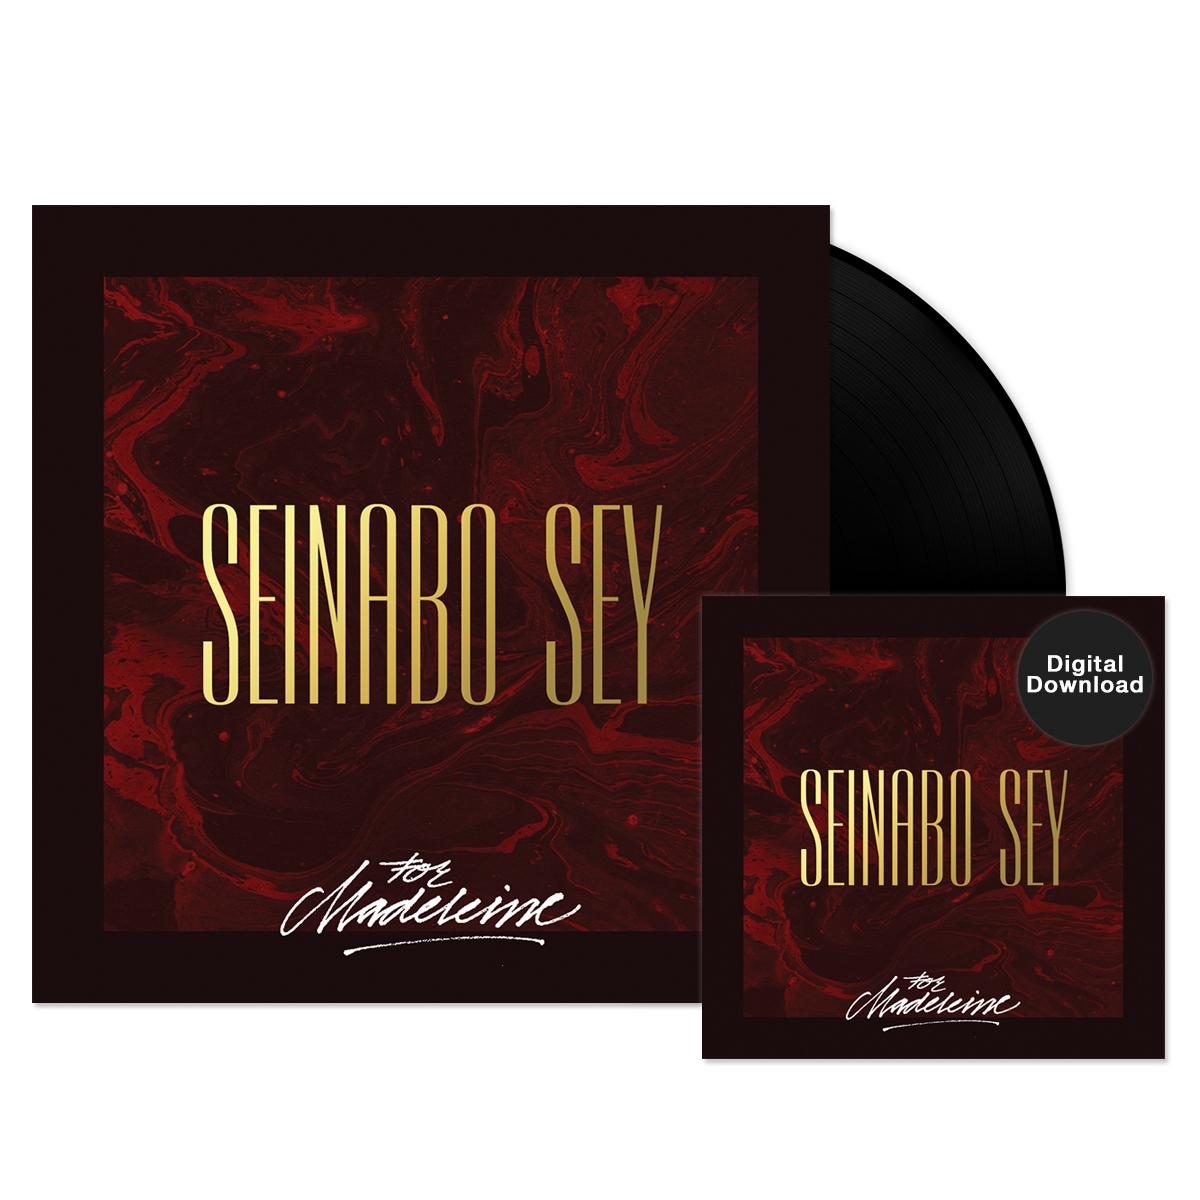 Seinabo Sey - For Madeleine EP Vinyl + Digital Download Bundle